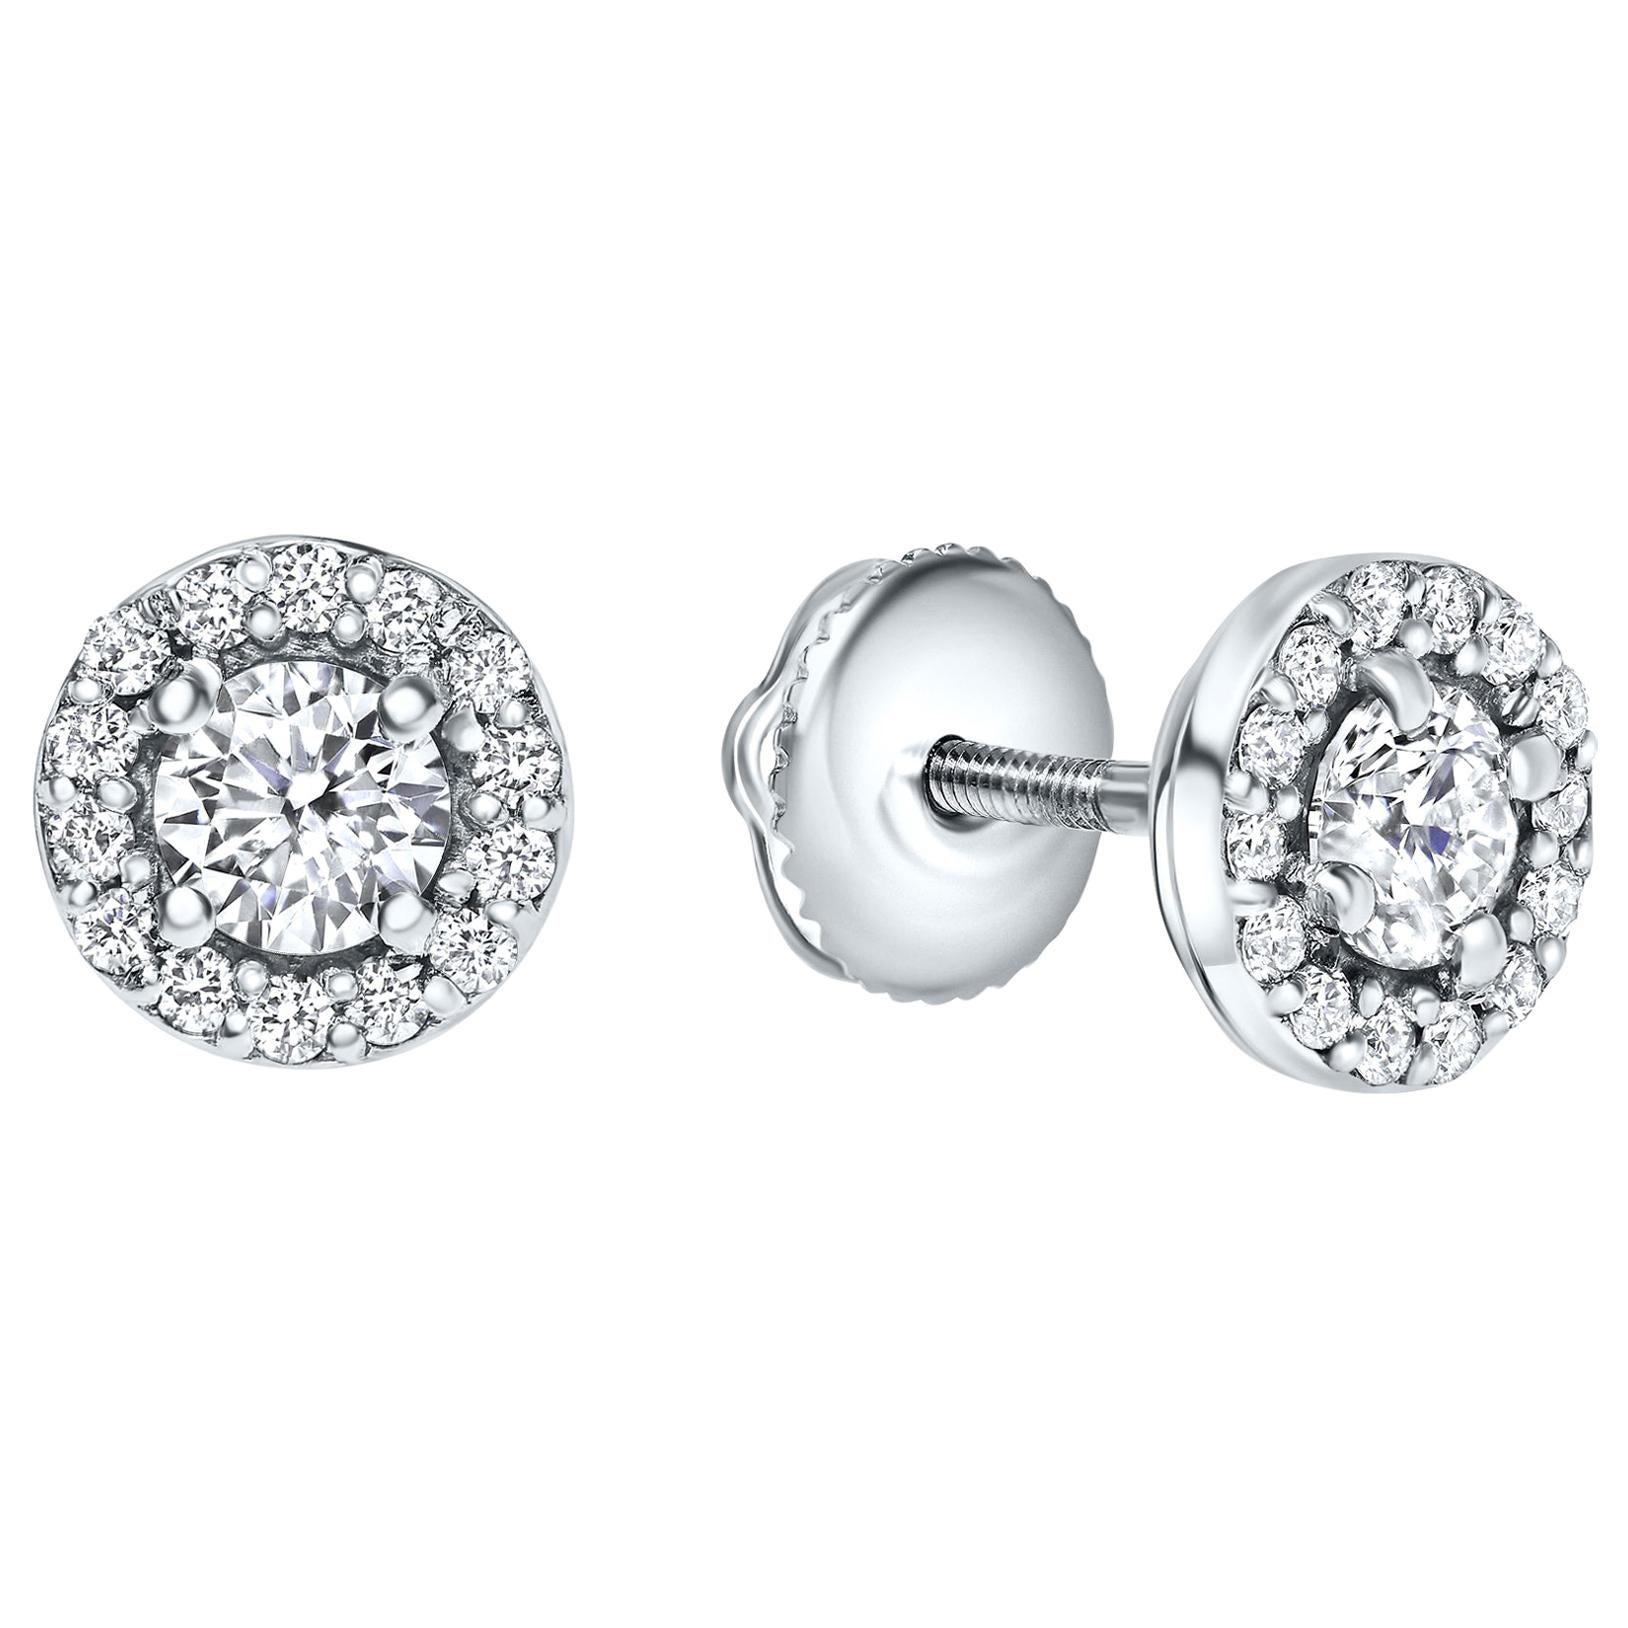 0.68 Carat Diamond Midi Halo Earrings in 14 Karat White Gold - Shlomit Rogel